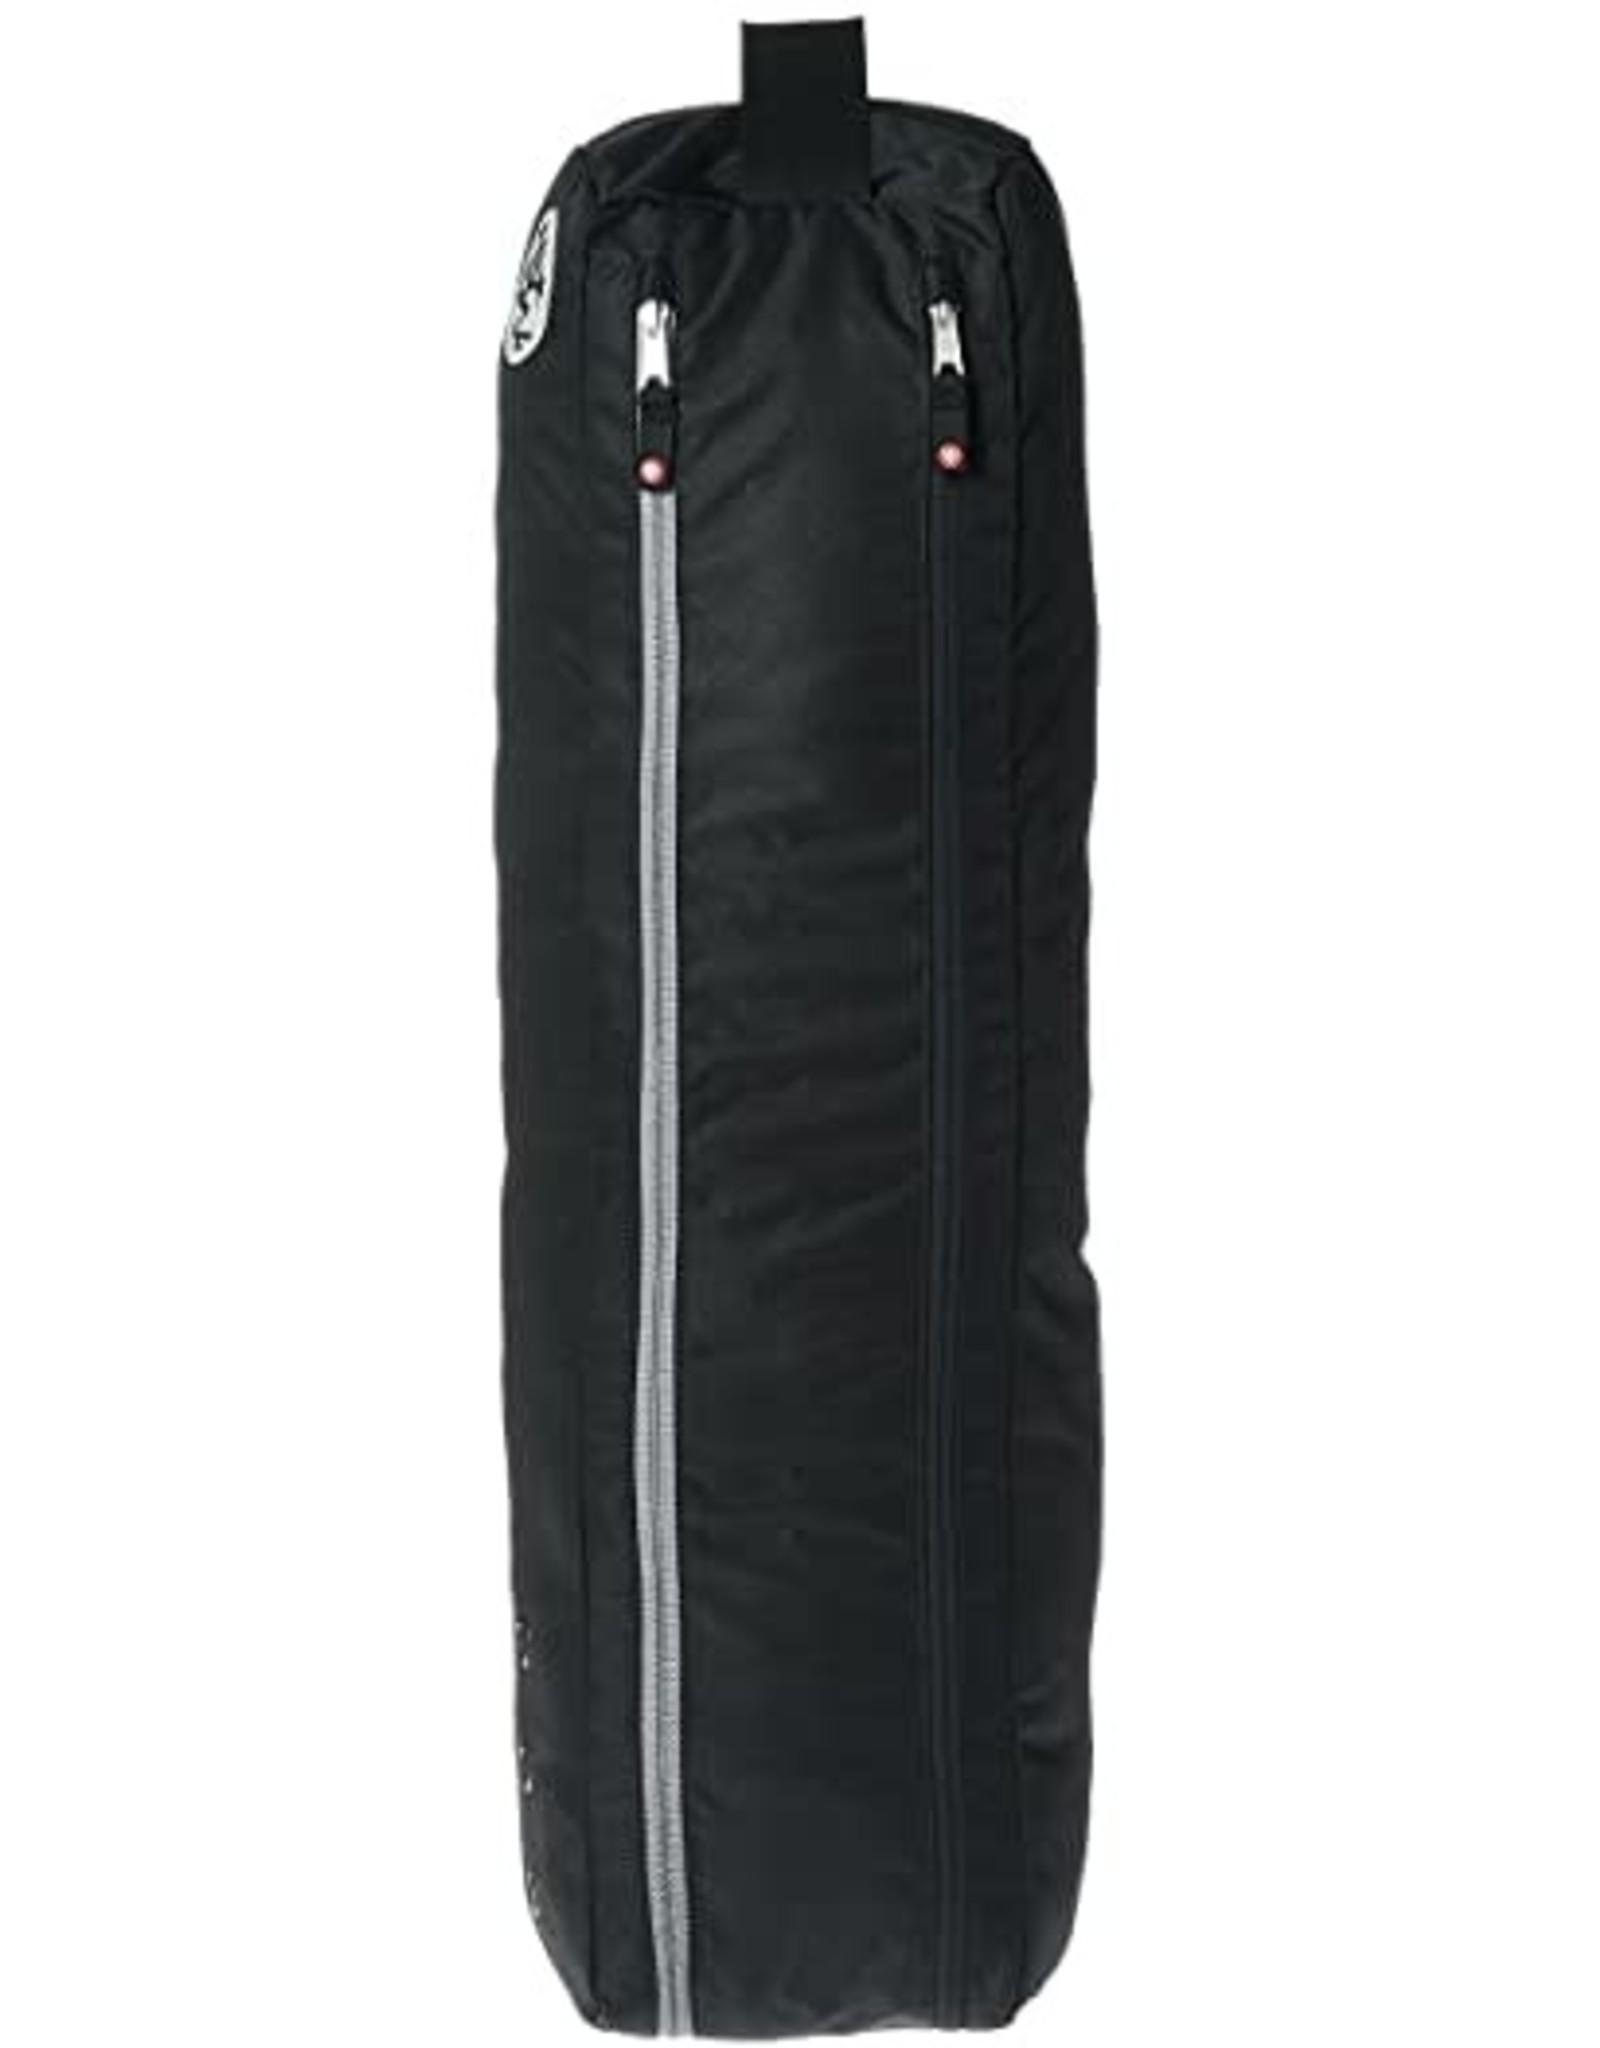 Manduka Go Steady 3.0 Black Bag